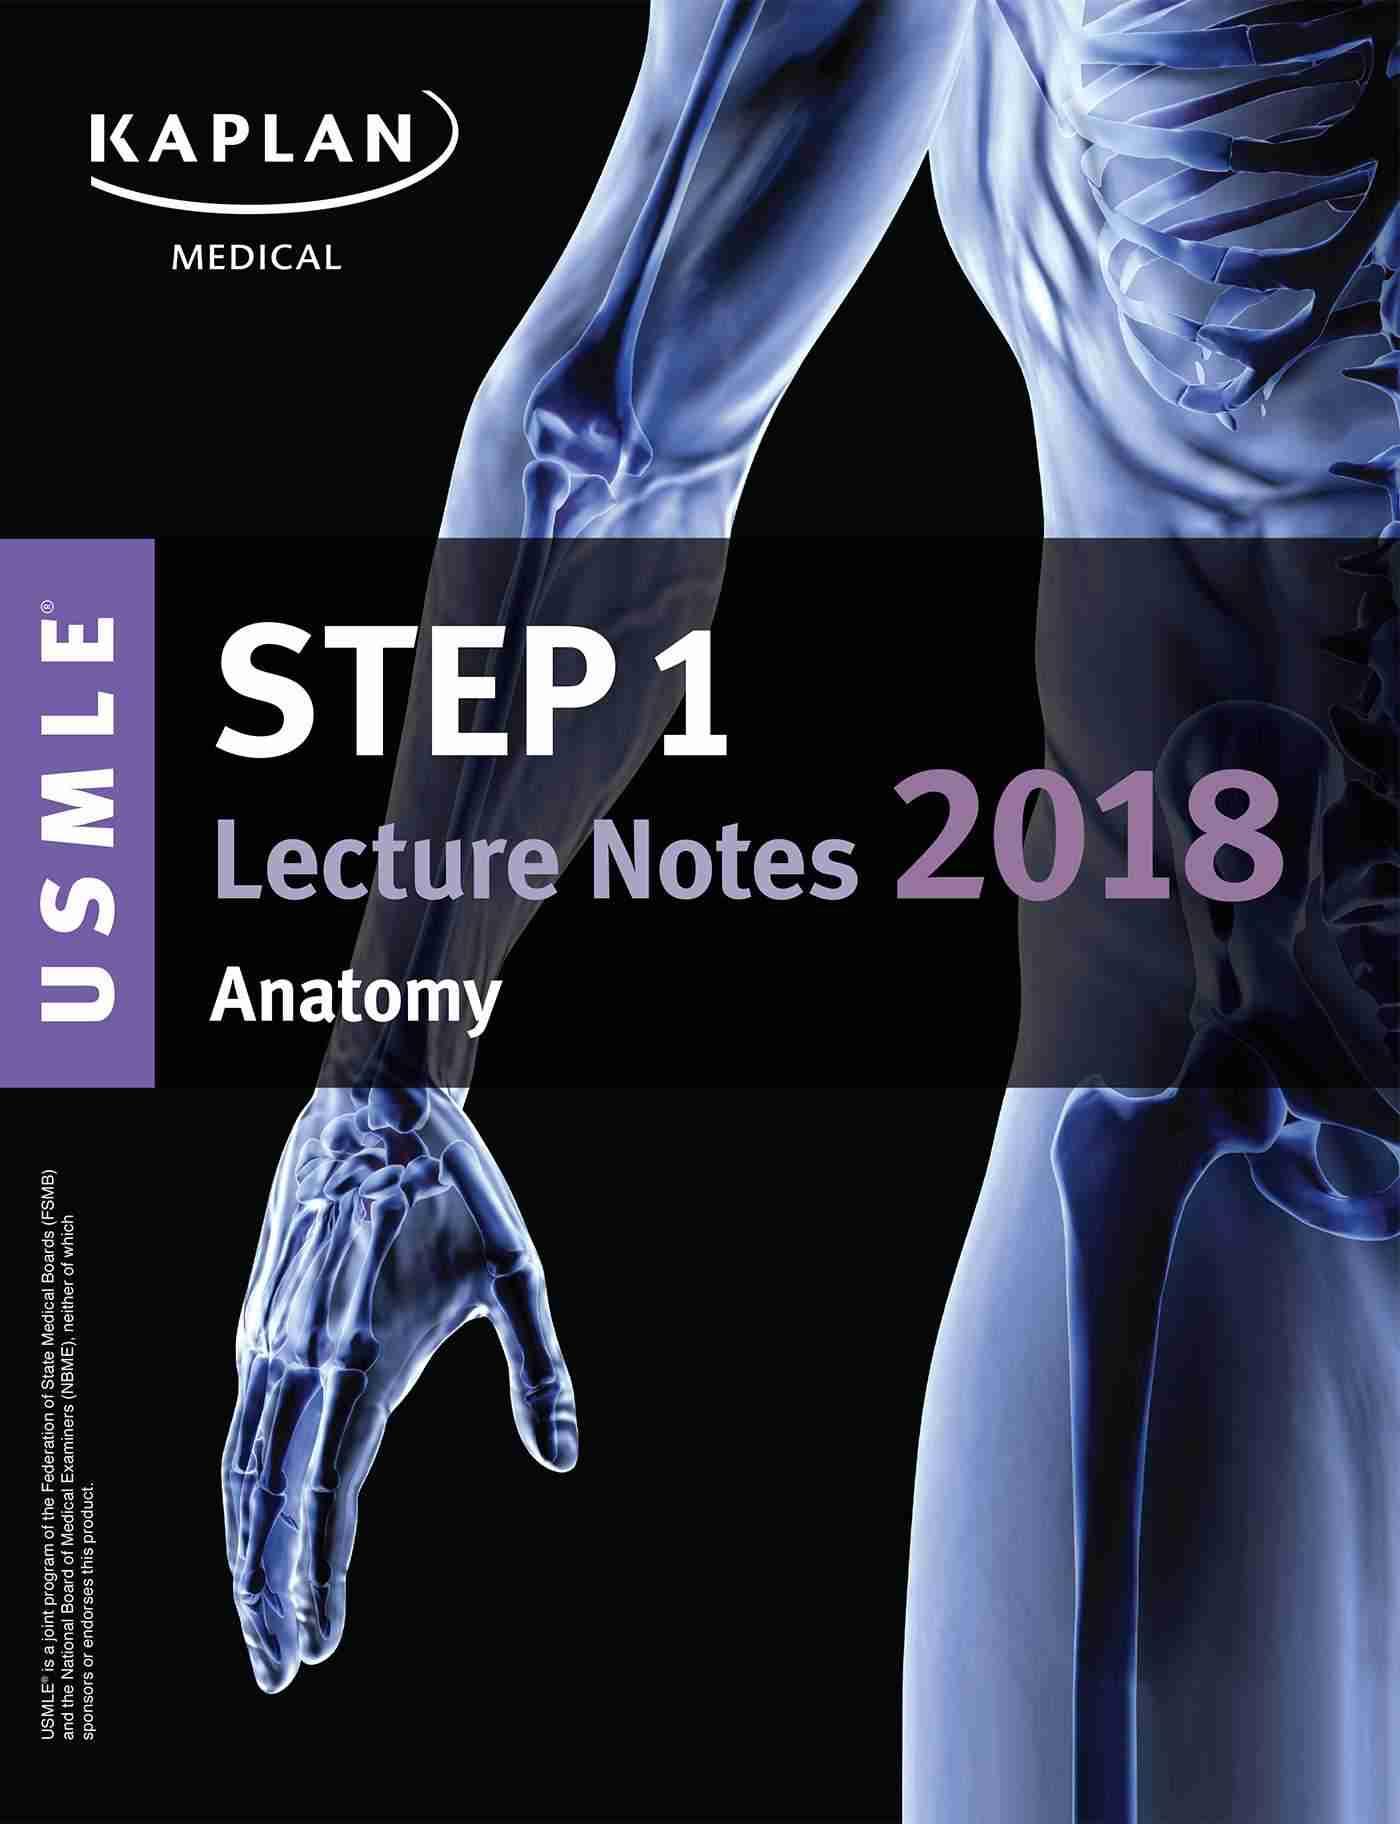 Kaplan Anatomy